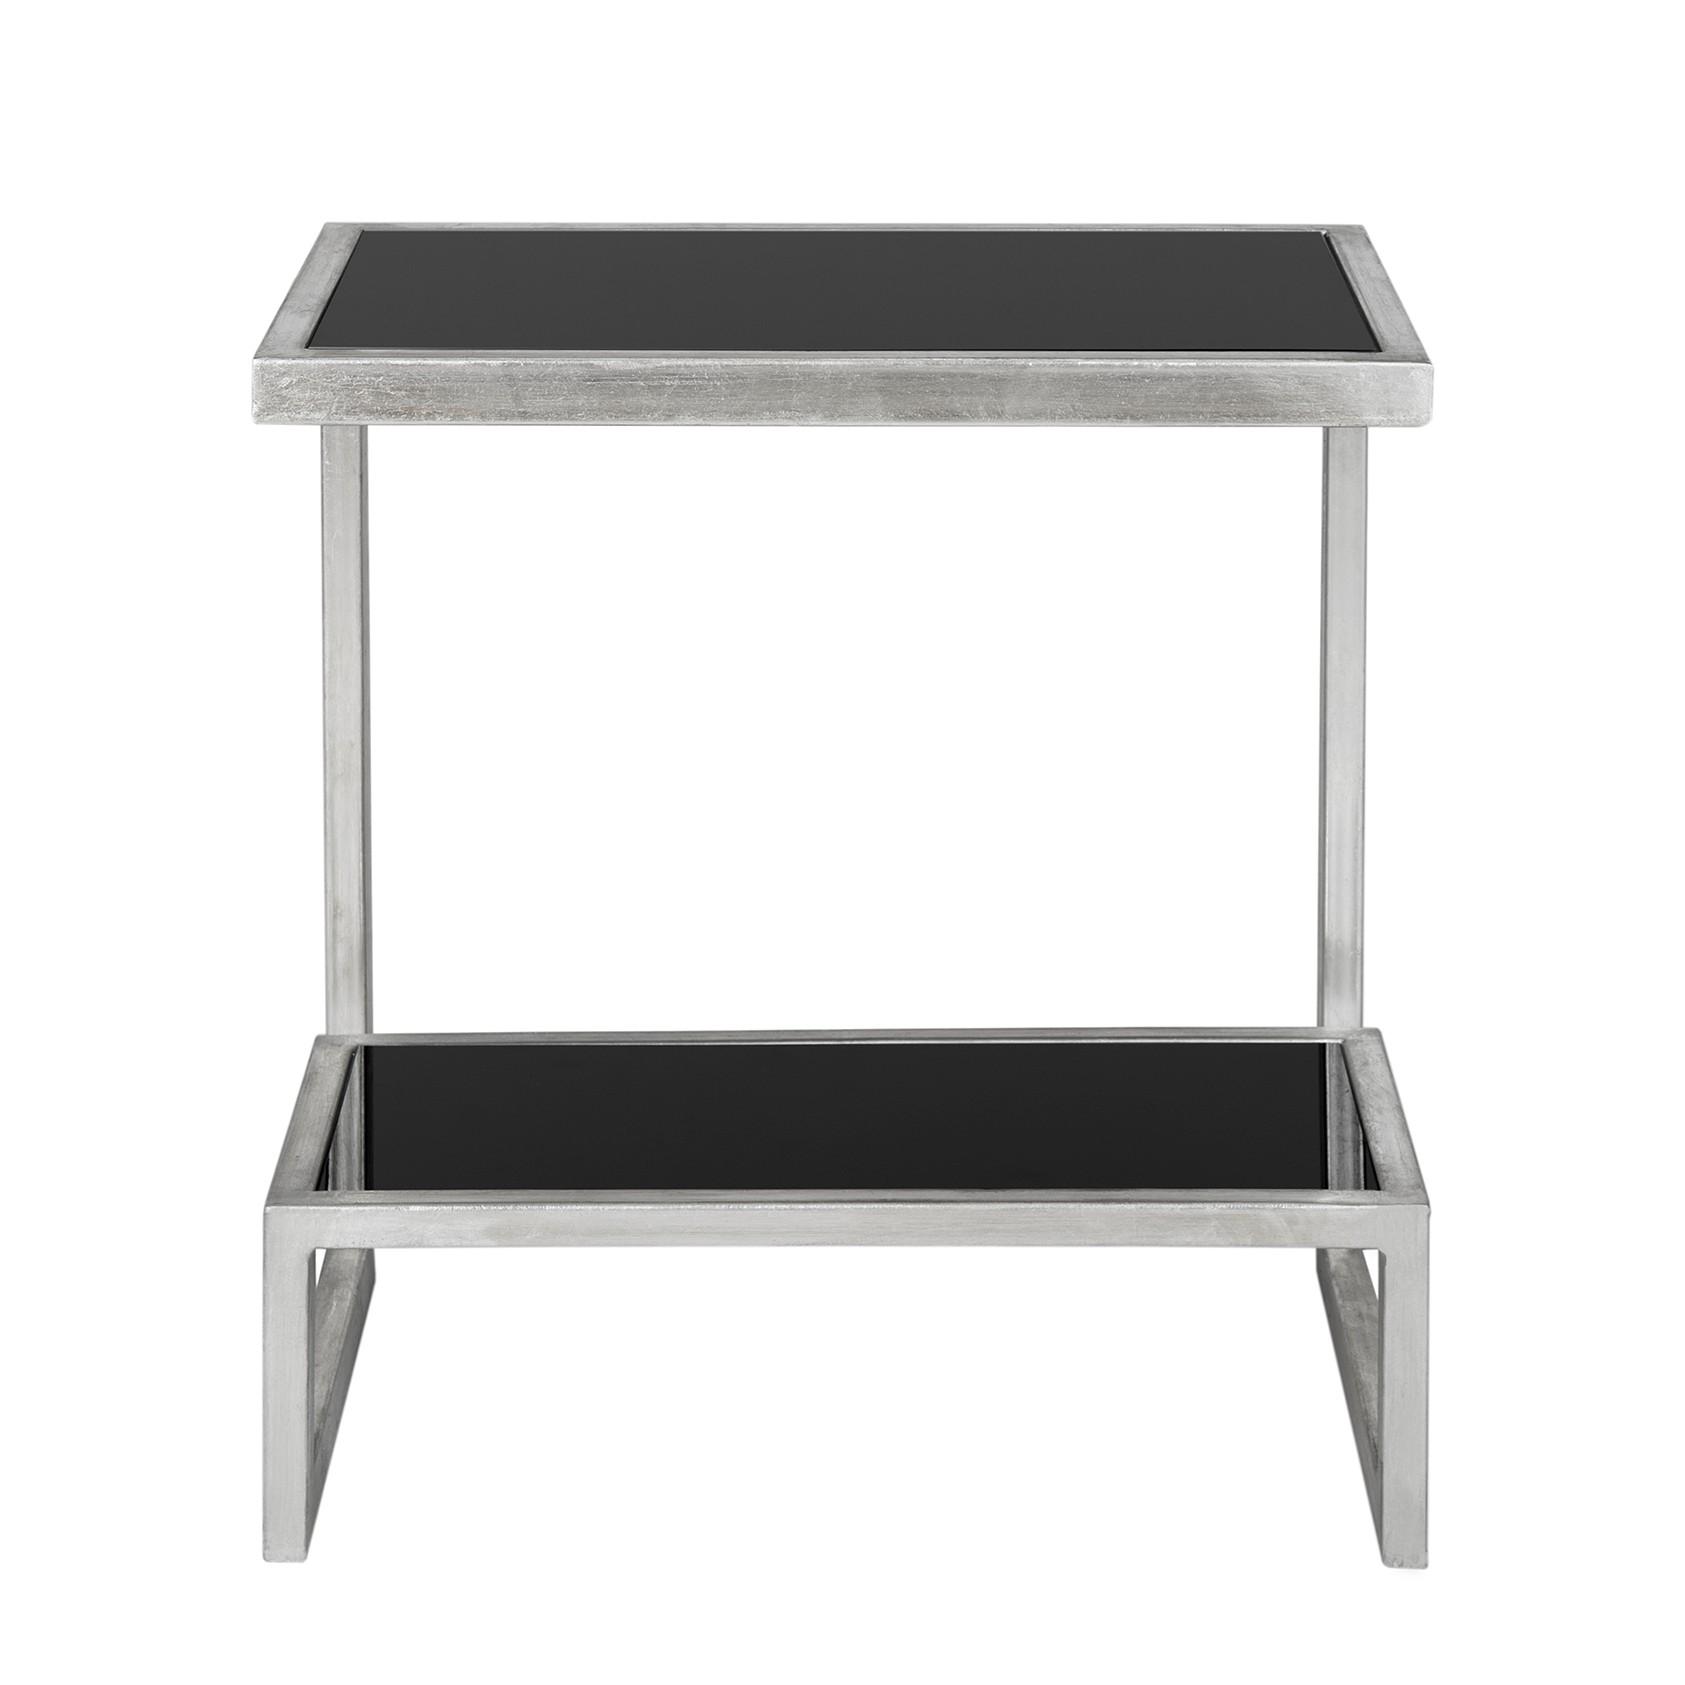 Tavolino Kennedy - Ferro/Vetro Color argento/Nero, Safavieh